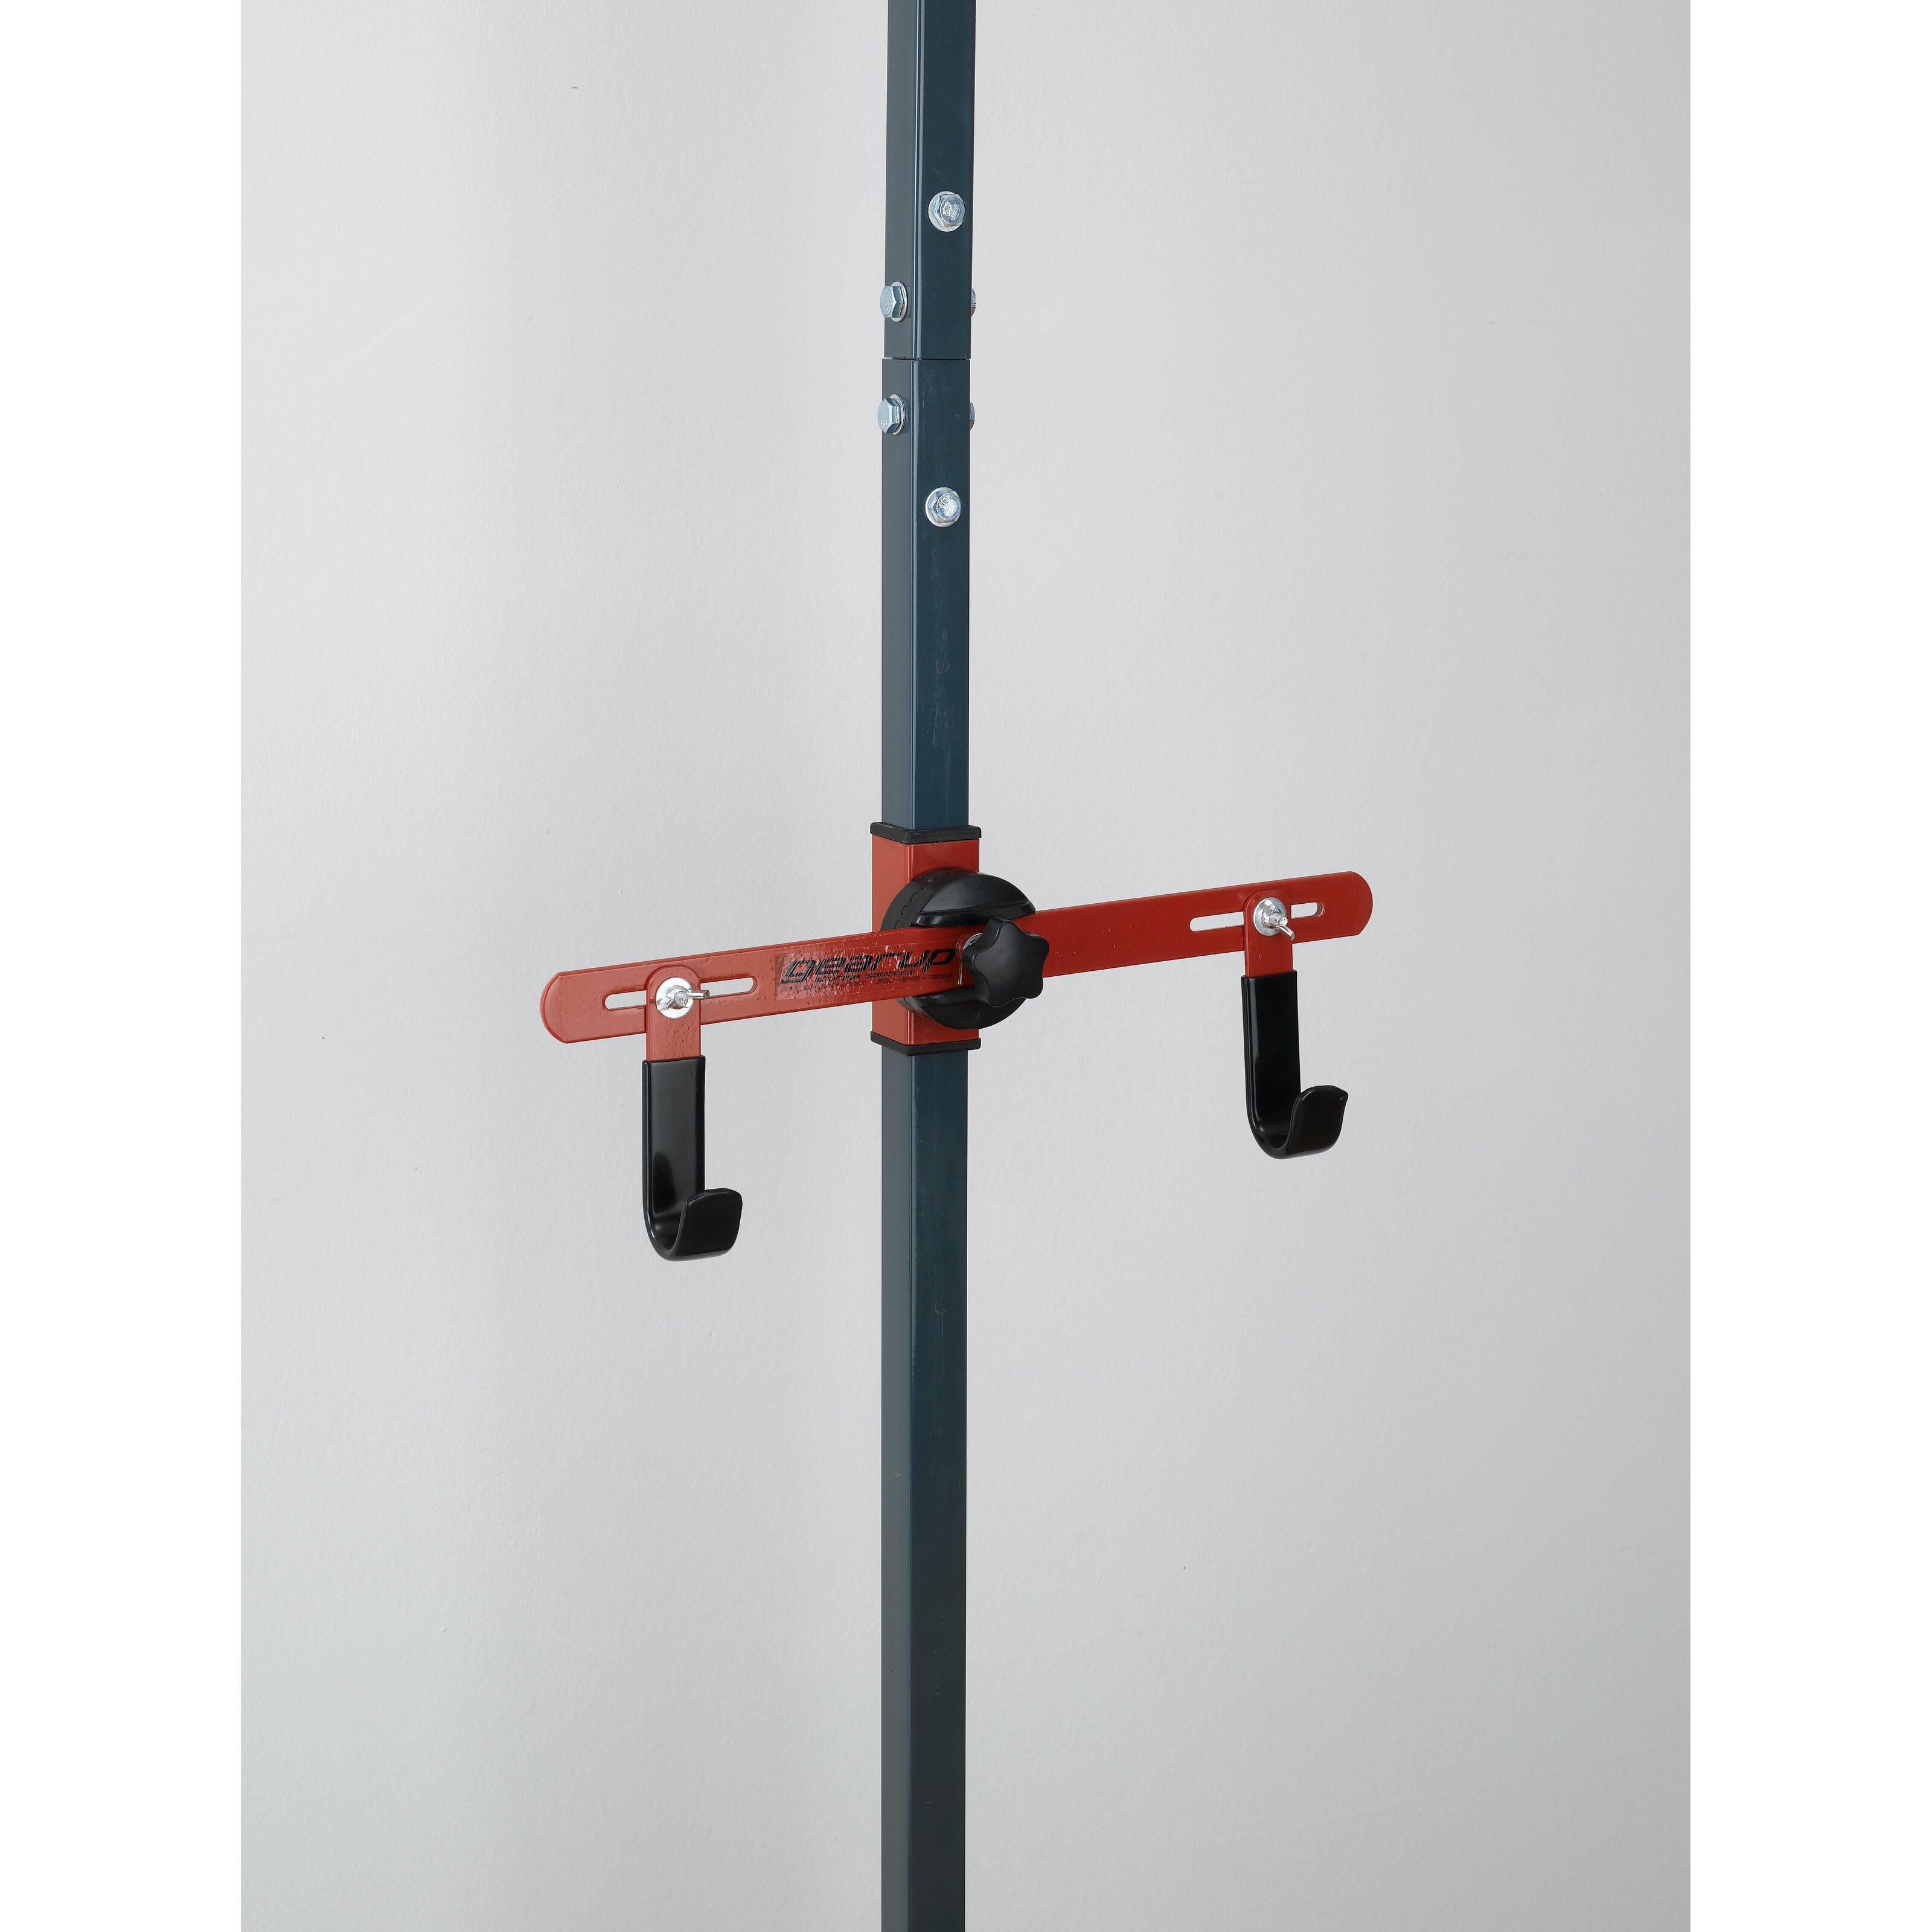 Gear Up Inc Platinum Series 2 Bike Floor To Ceiling